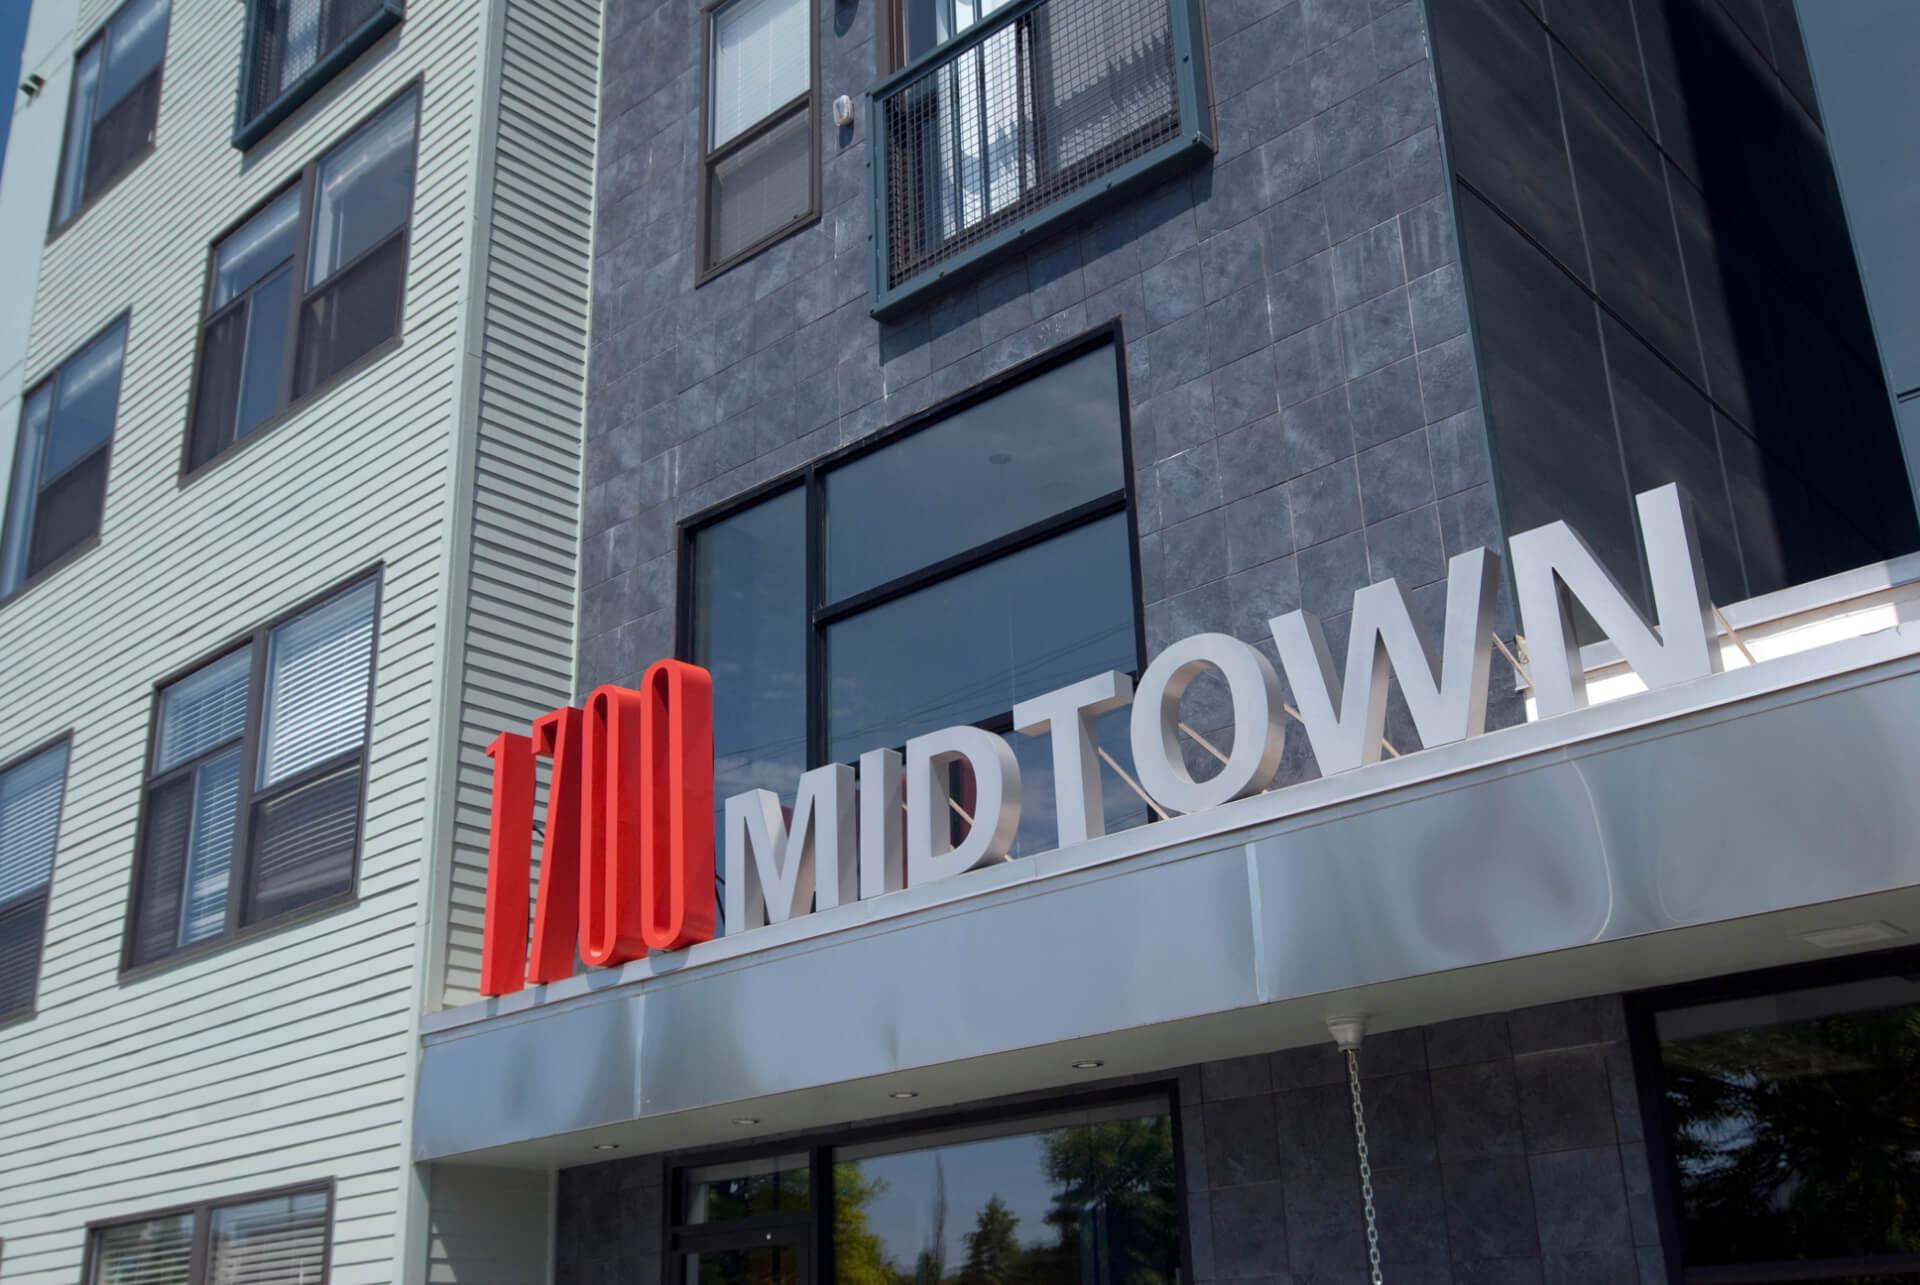 1700 Midtown